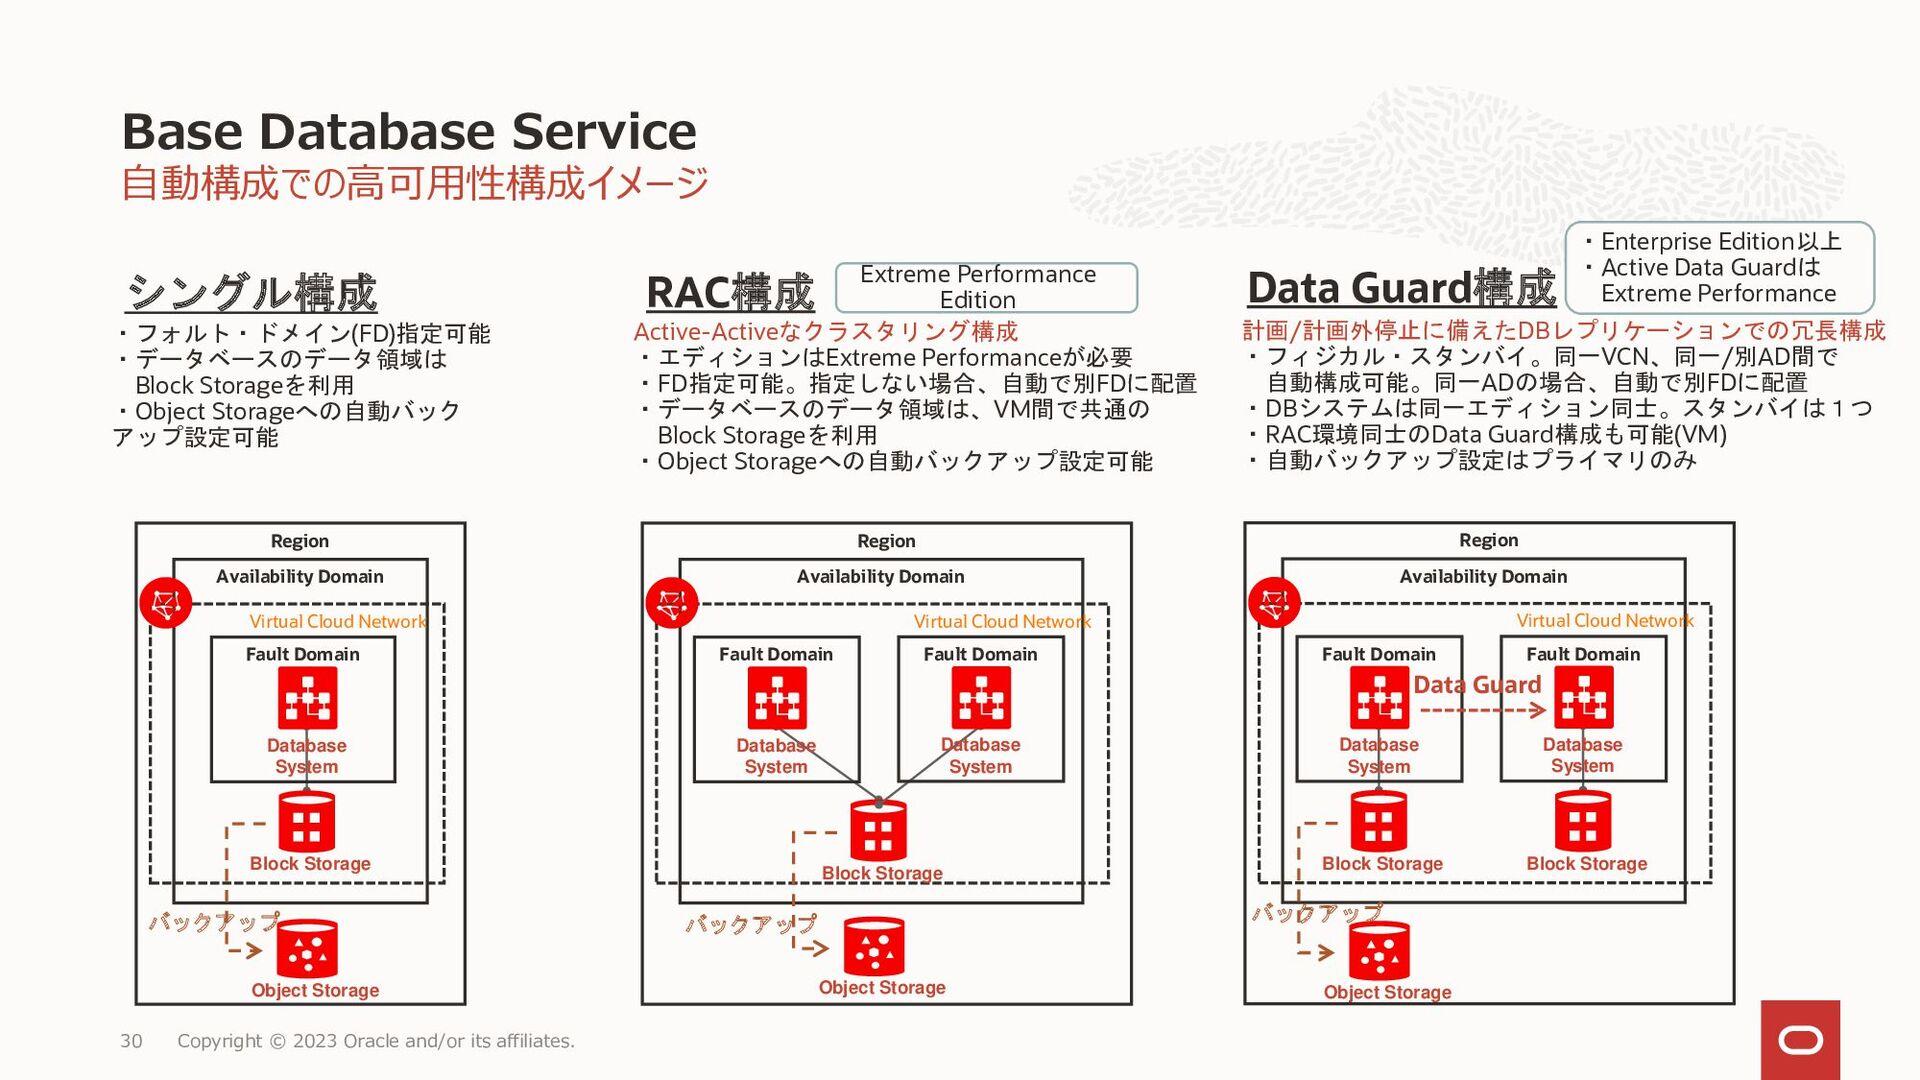 30 DBシステム作成画面にて、OCPU数が2の仮想マシン シェイプを選択しTotal Nod...